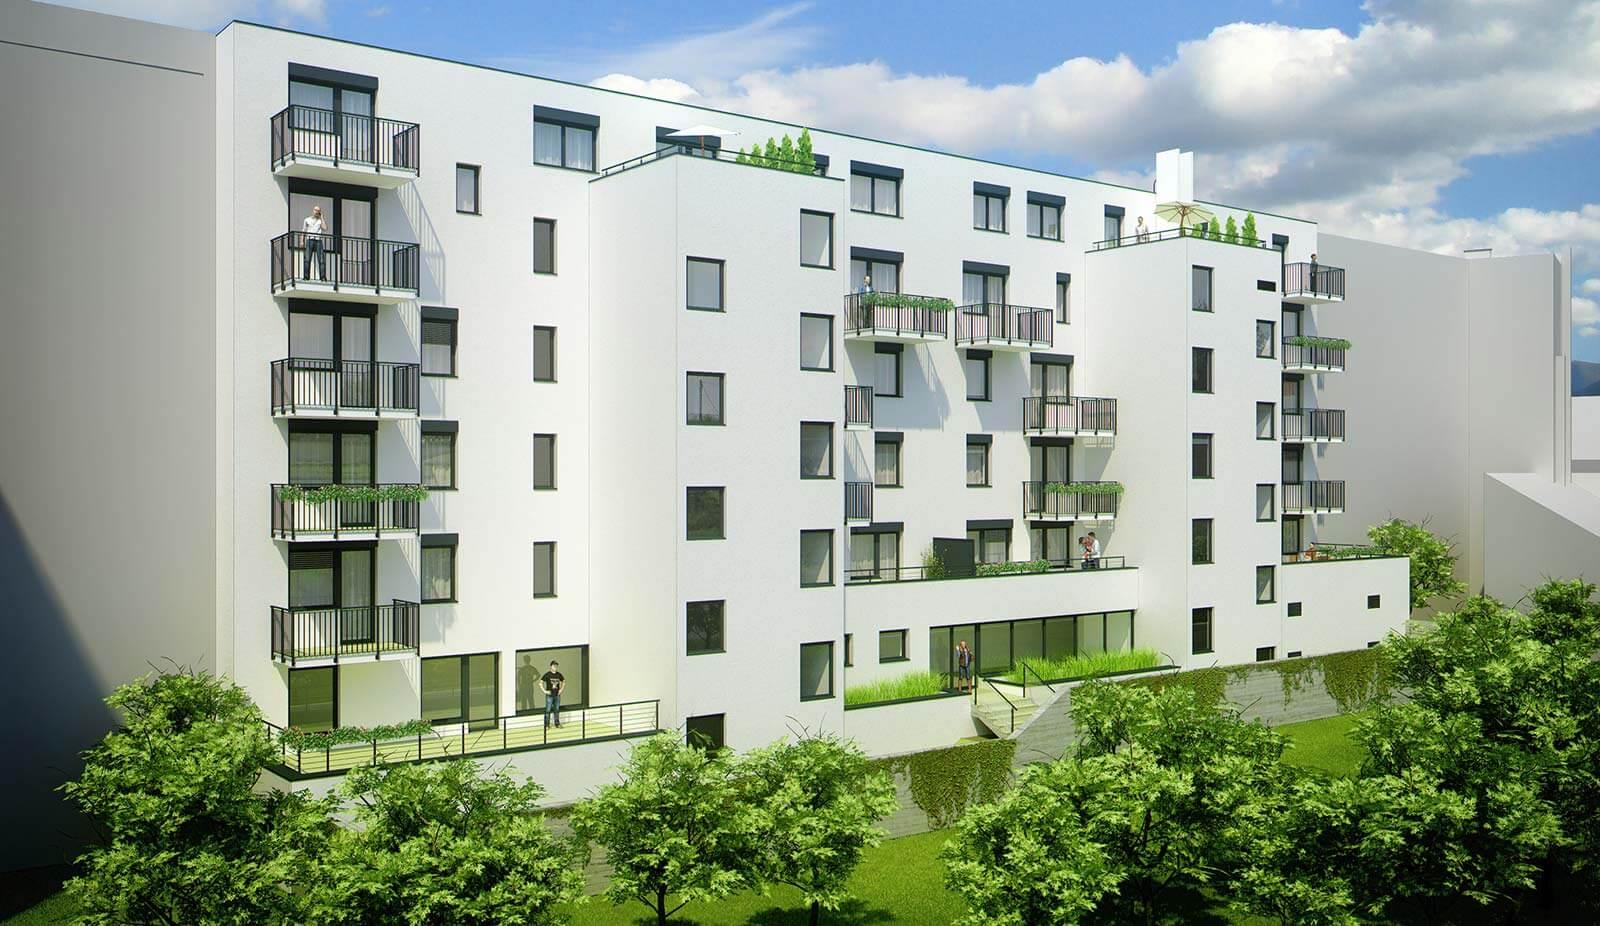 Novostavba 4 izbový byt, širšie centrum v Bratislave, Beskydská ulica, 90,37m2, balkón 4,5m2, štandard.-9